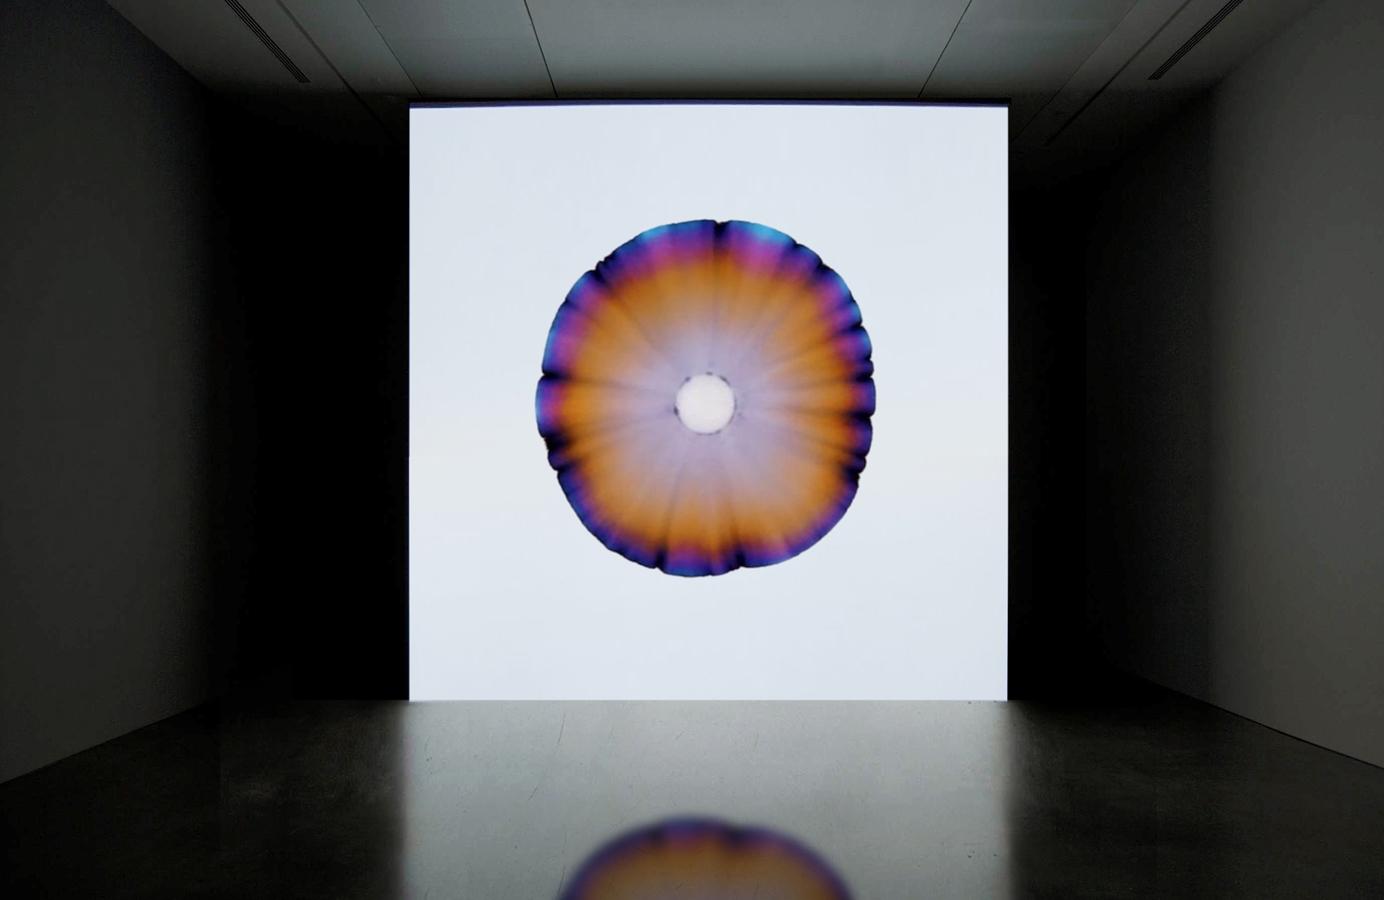 'Time Only Exists So Not Everything Happens At Once', 2014 | Troika (Eva Rucki, Sebastien Noel, Conny Freyer)